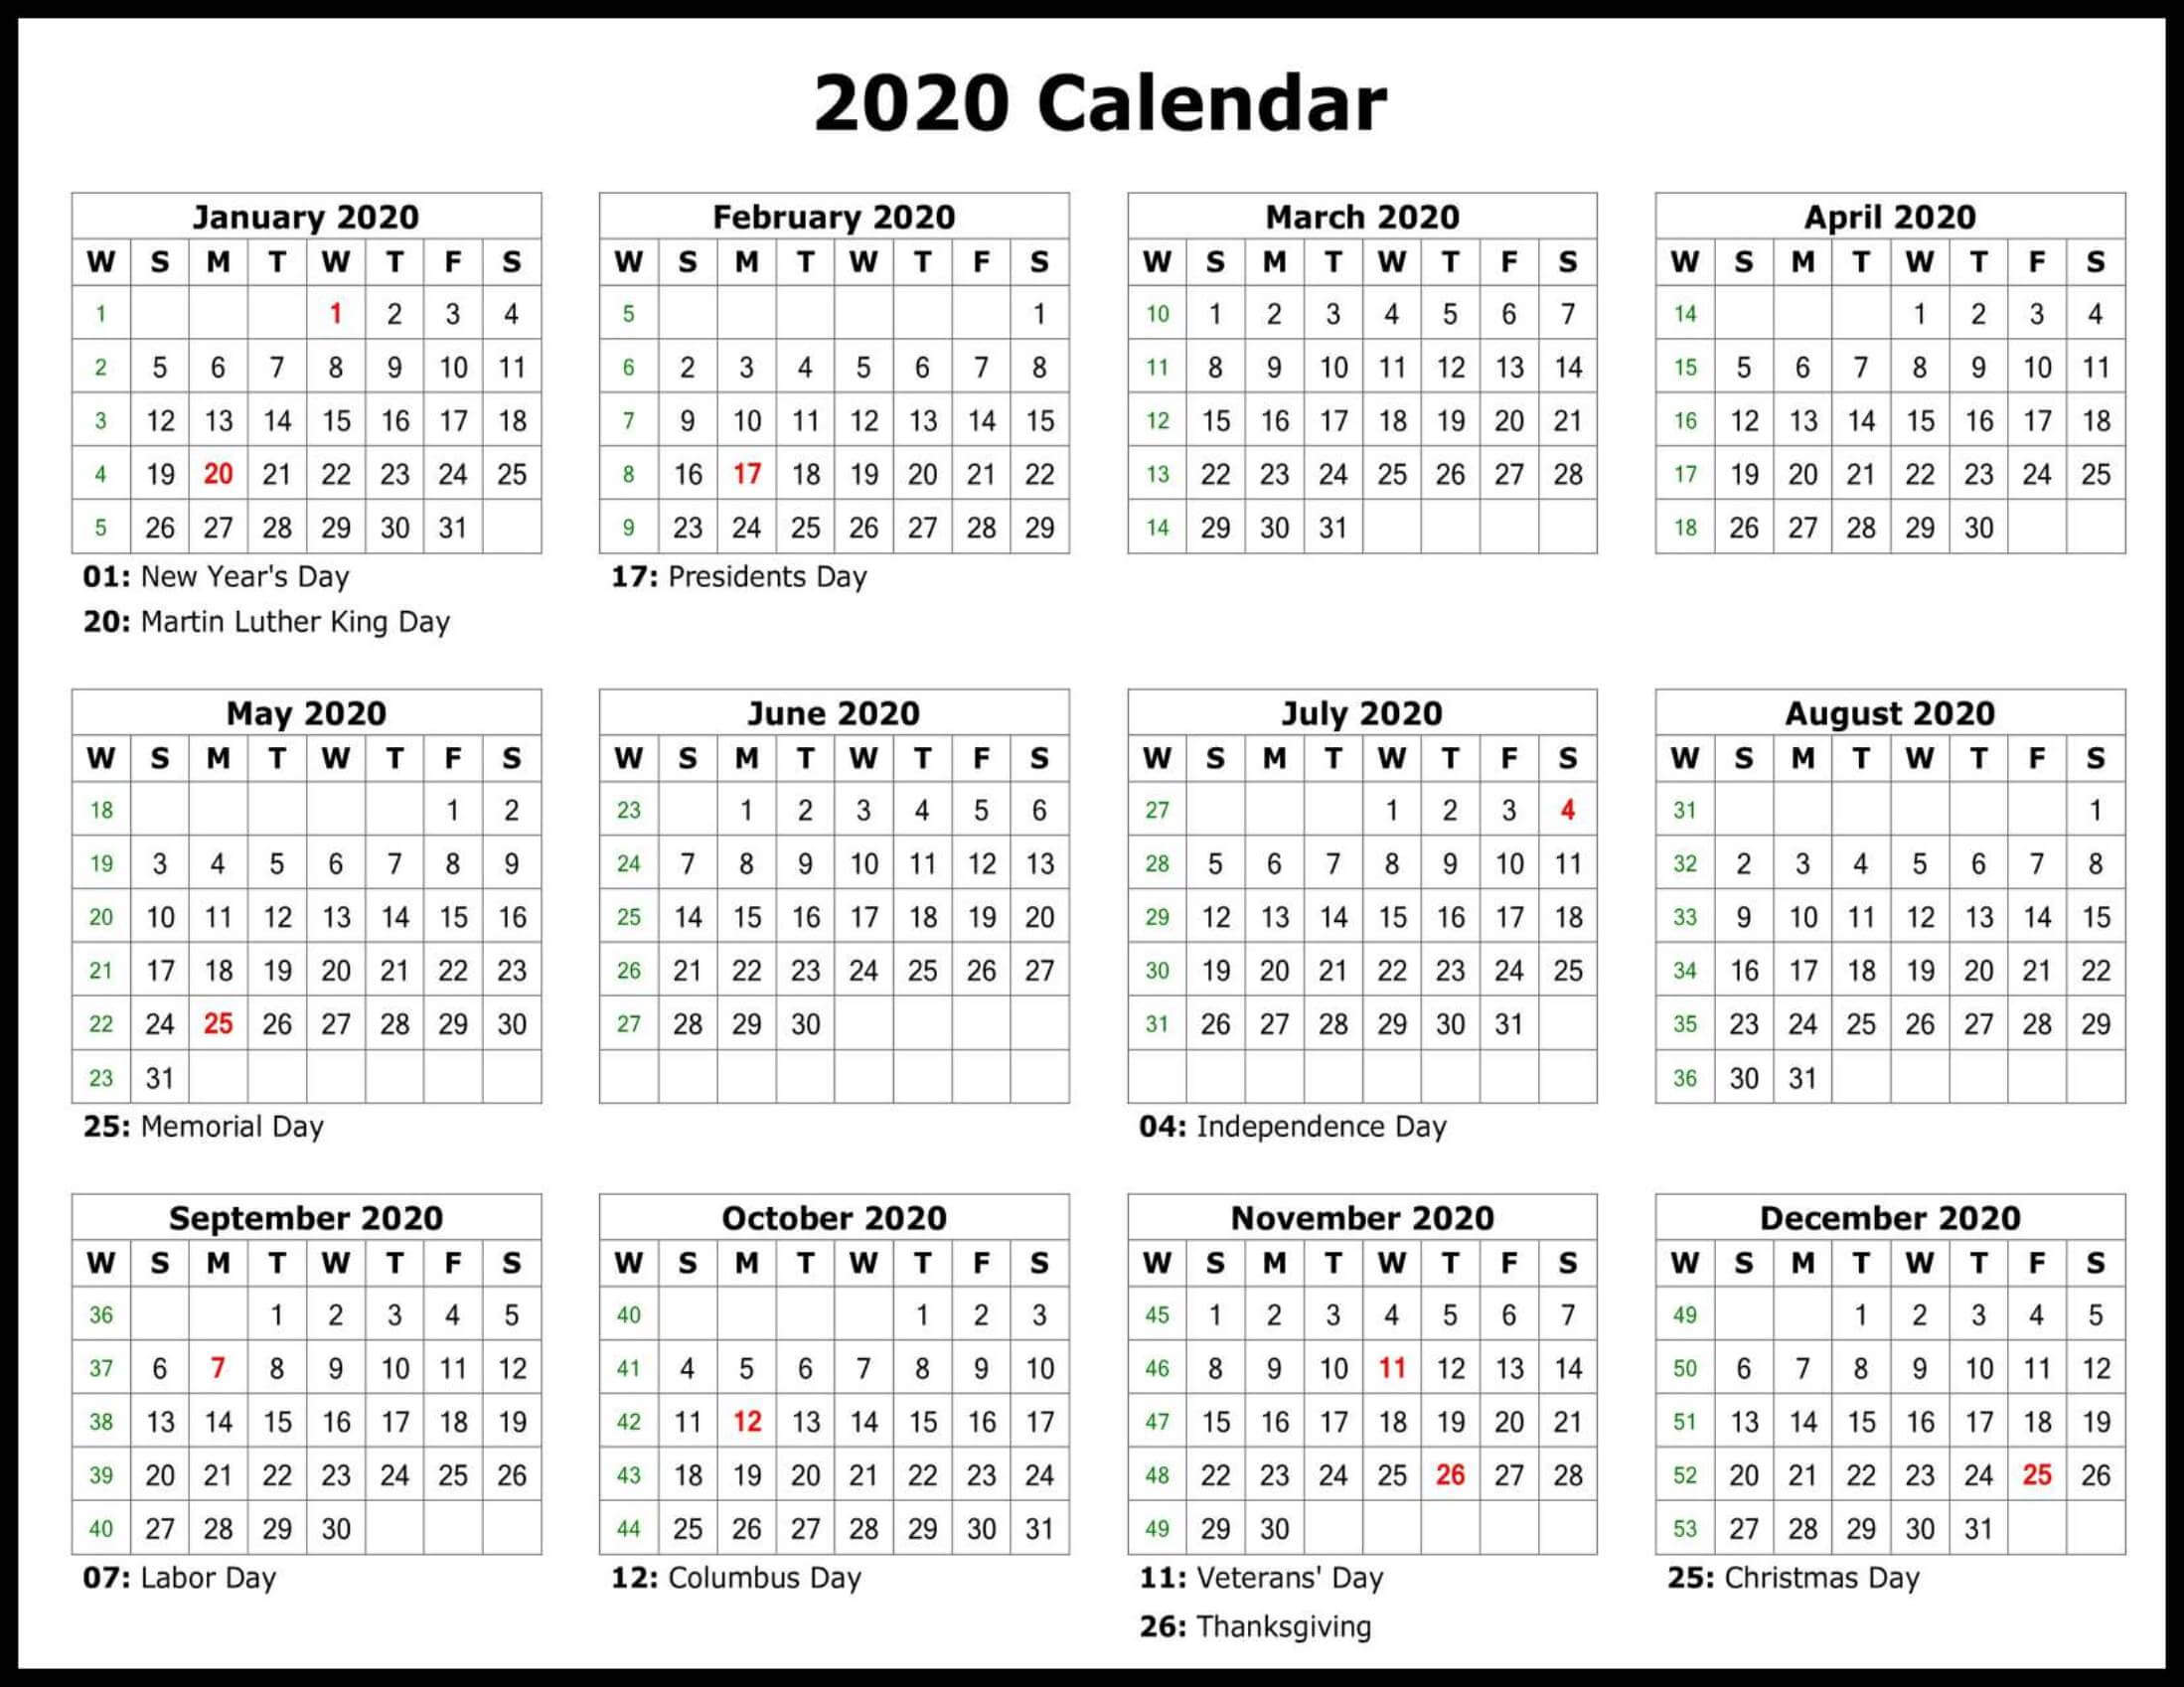 Fiscal Year Calendar 2020 US